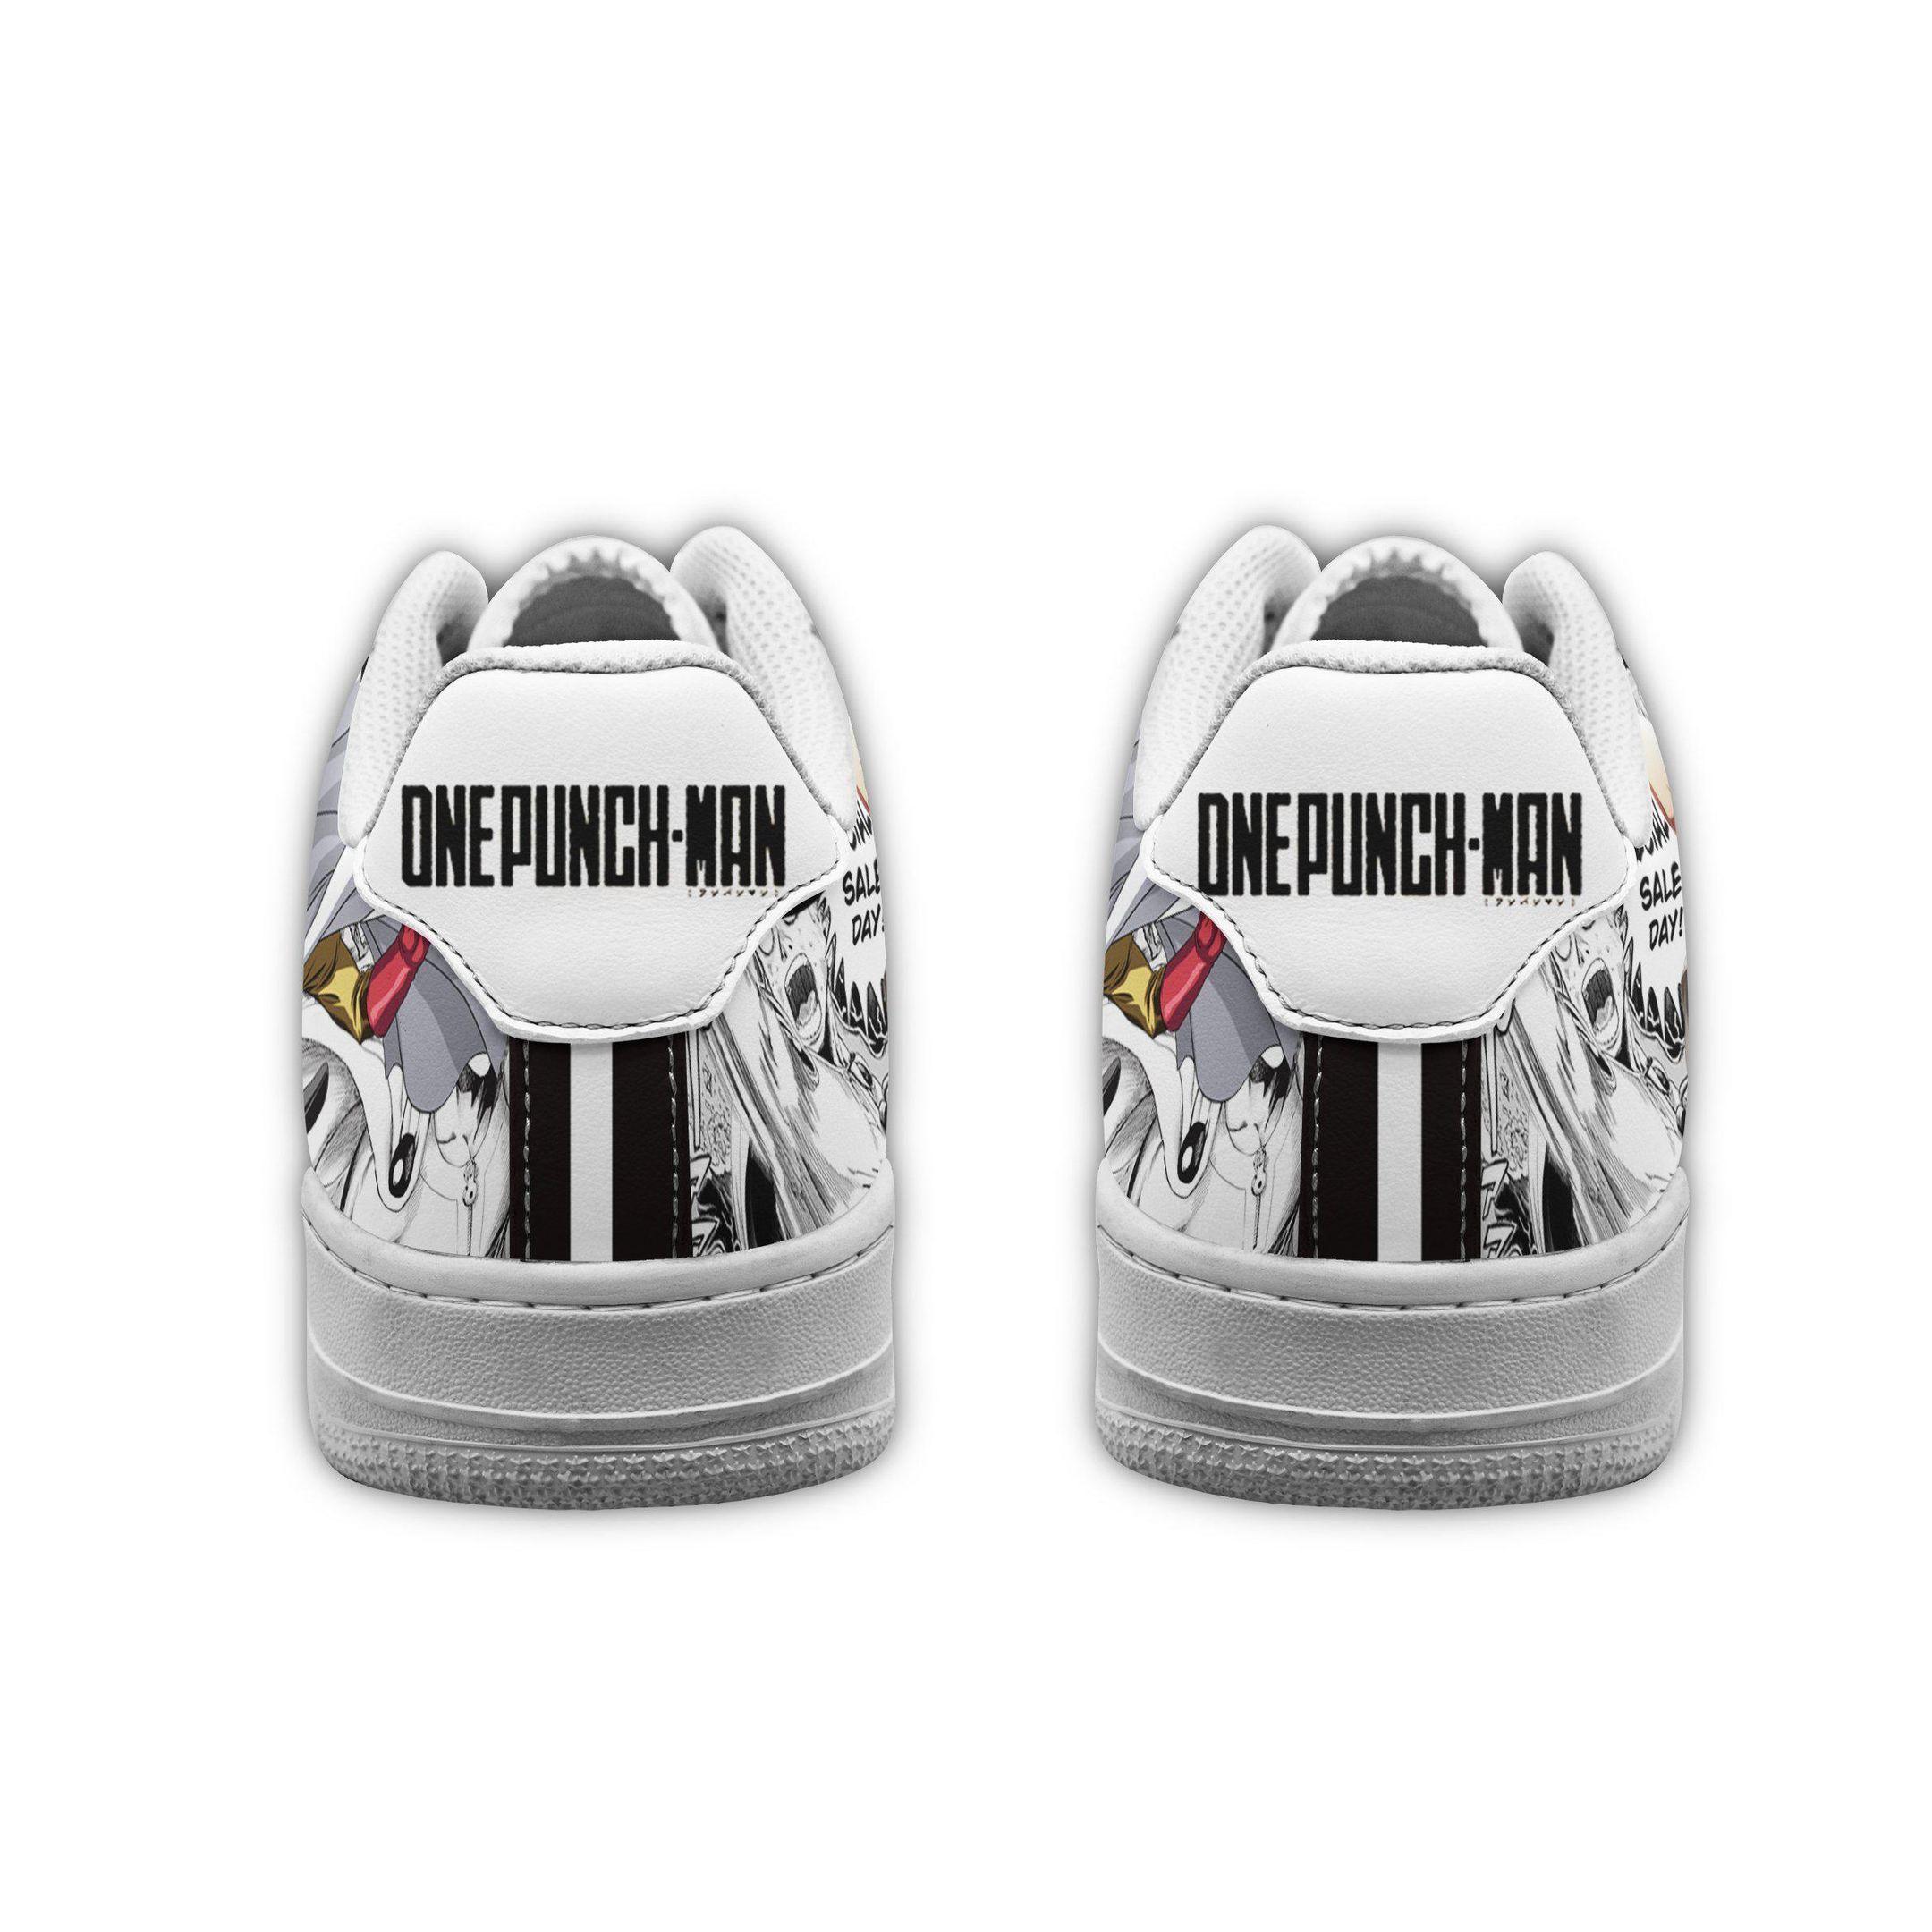 One Punch Man Air Shoes Manga Anime Shoes Fan Gift Idea GO1012